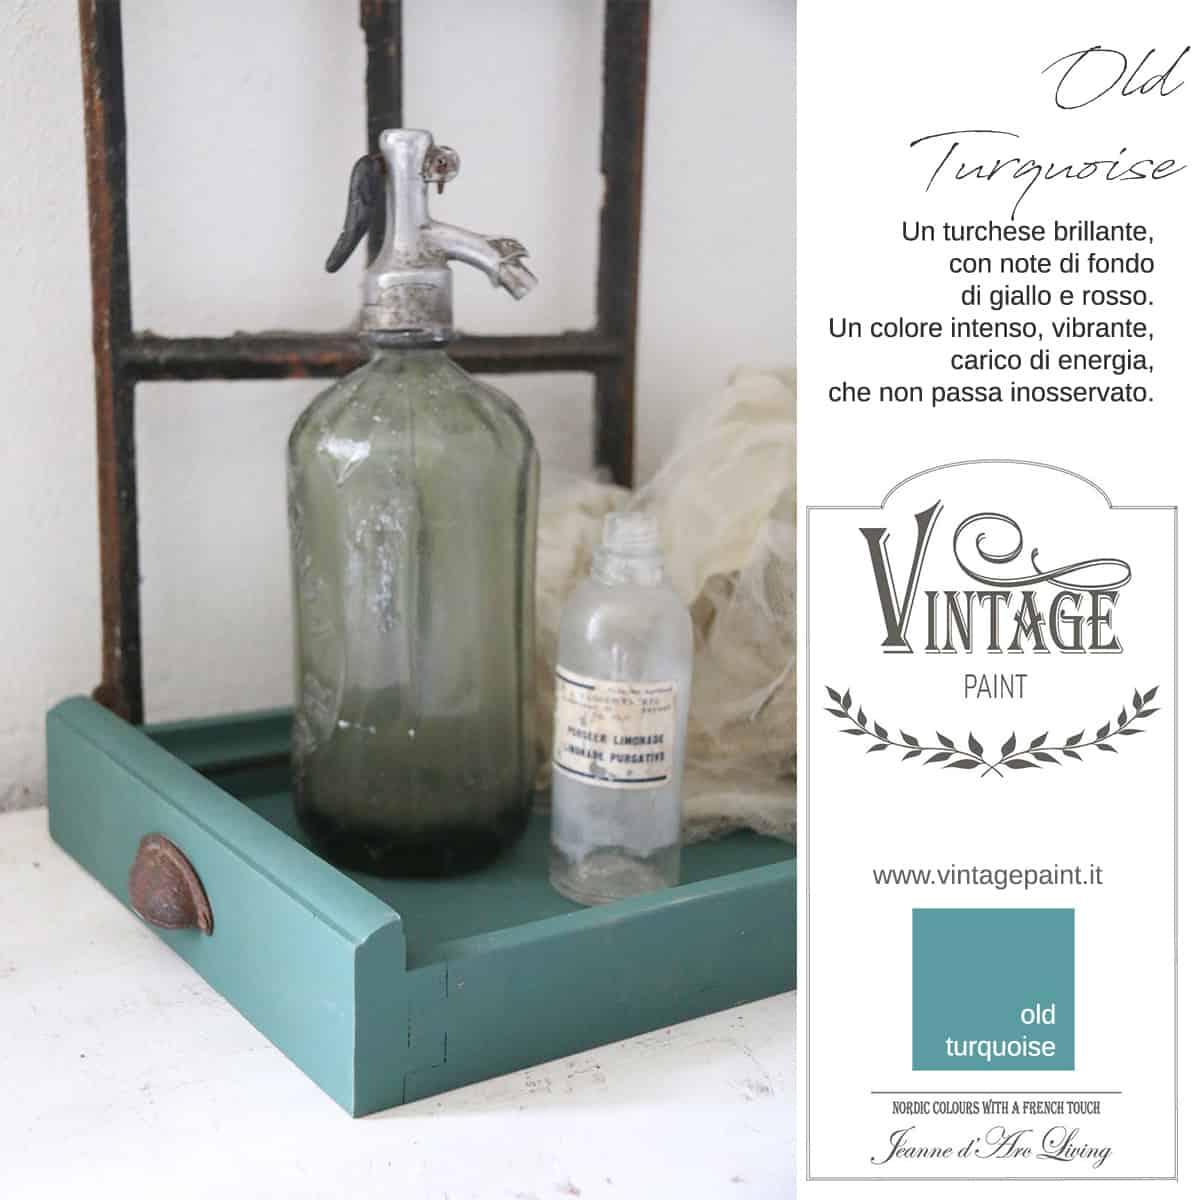 old turquoise turchese blu azzurro vintage chalk paint vernici shabby chic autentico look gesso